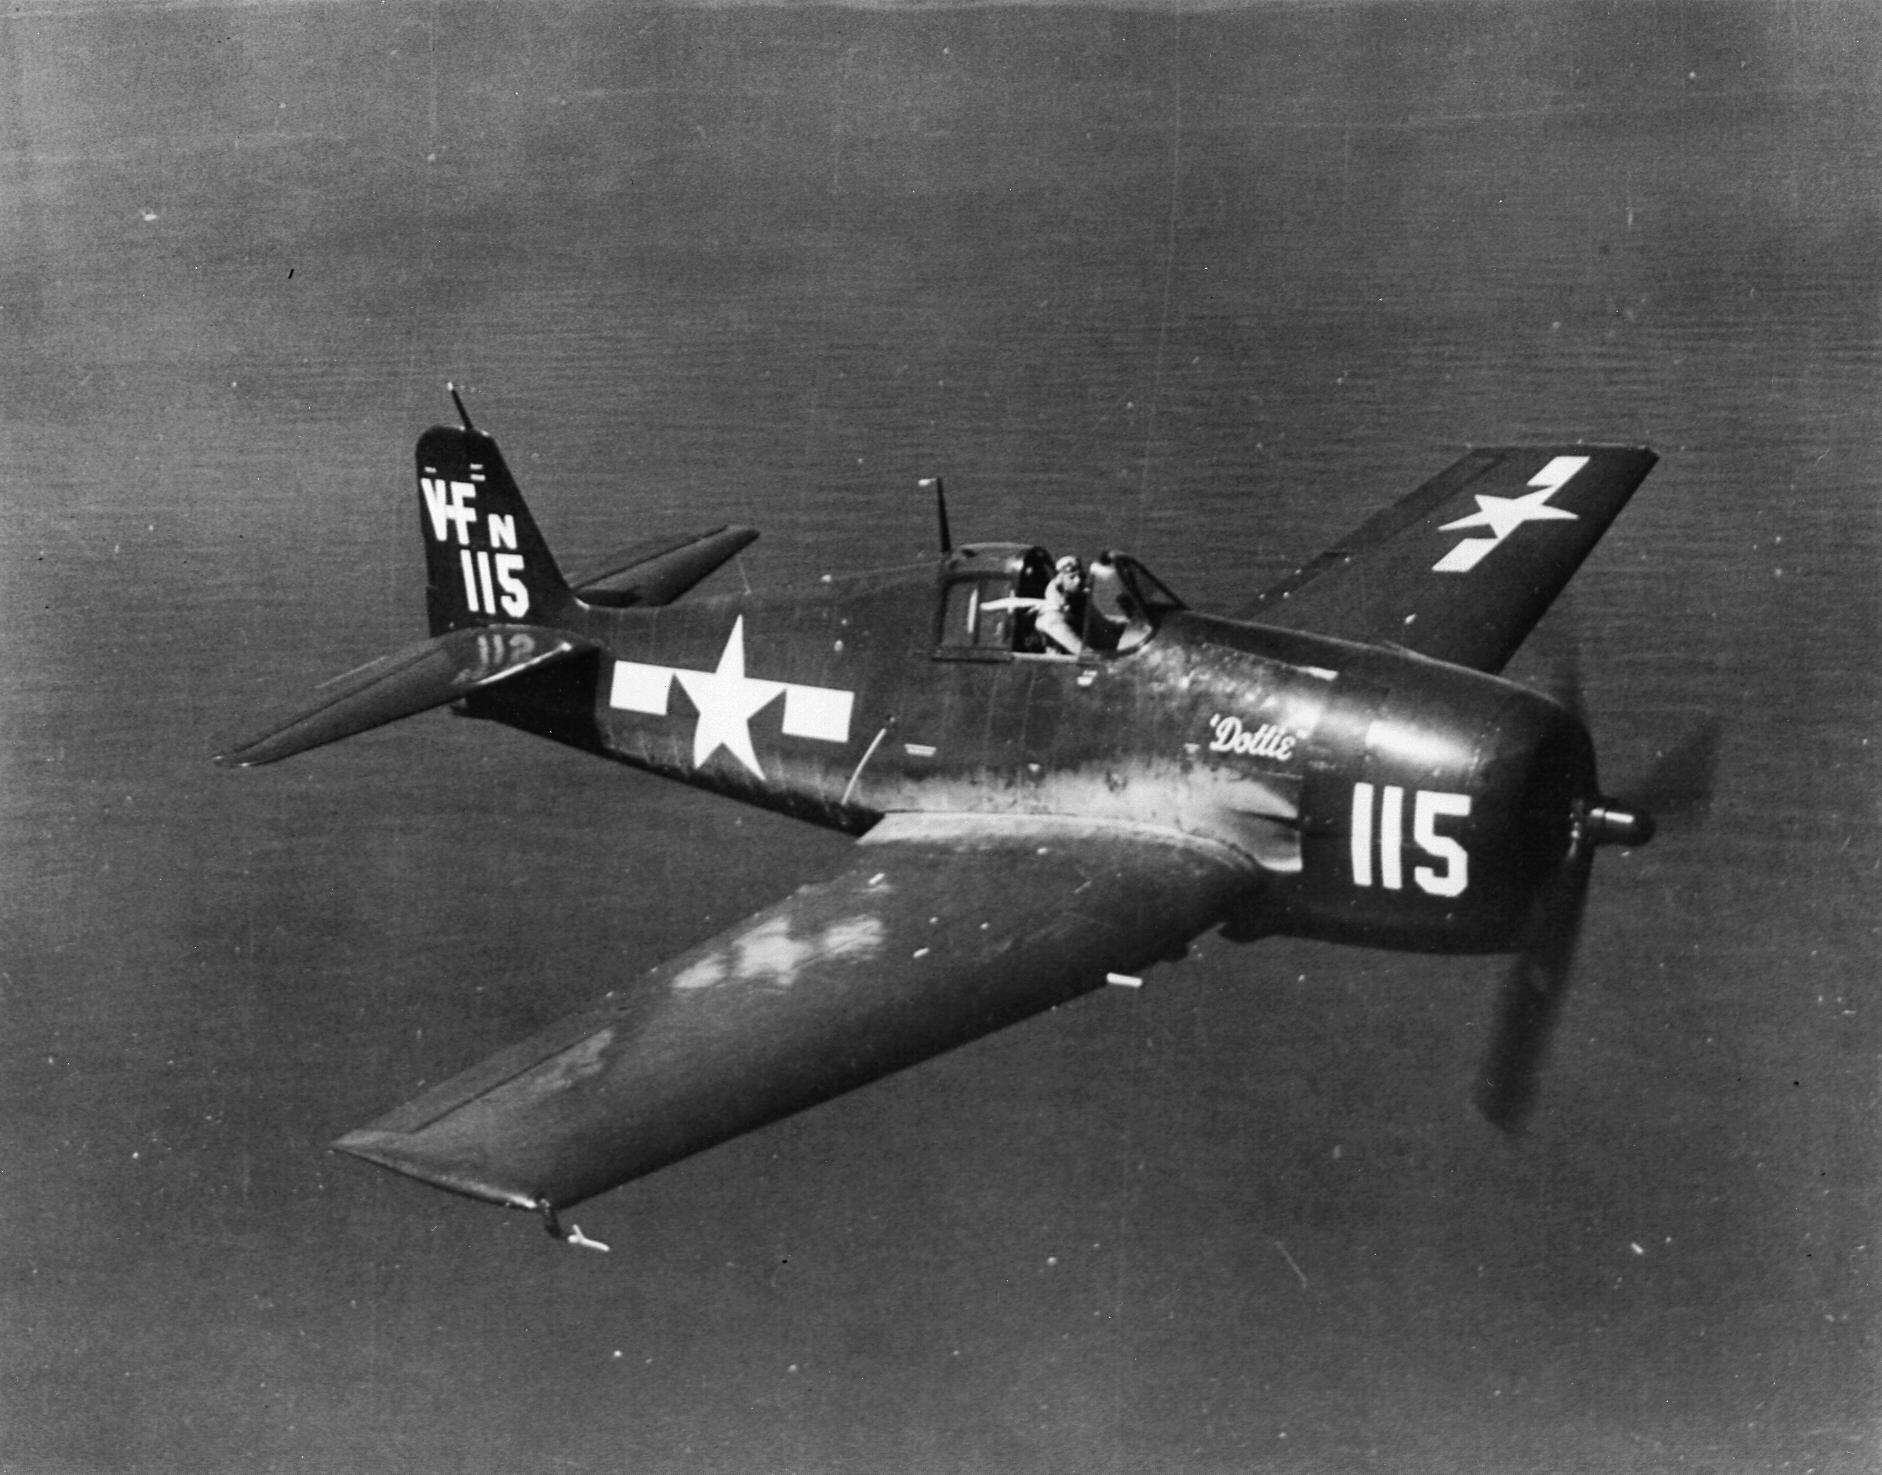 Grumman F6F 5 Hellcat VFN 1 White 115 Dottie OTU from NAS Vero Beach FL 01